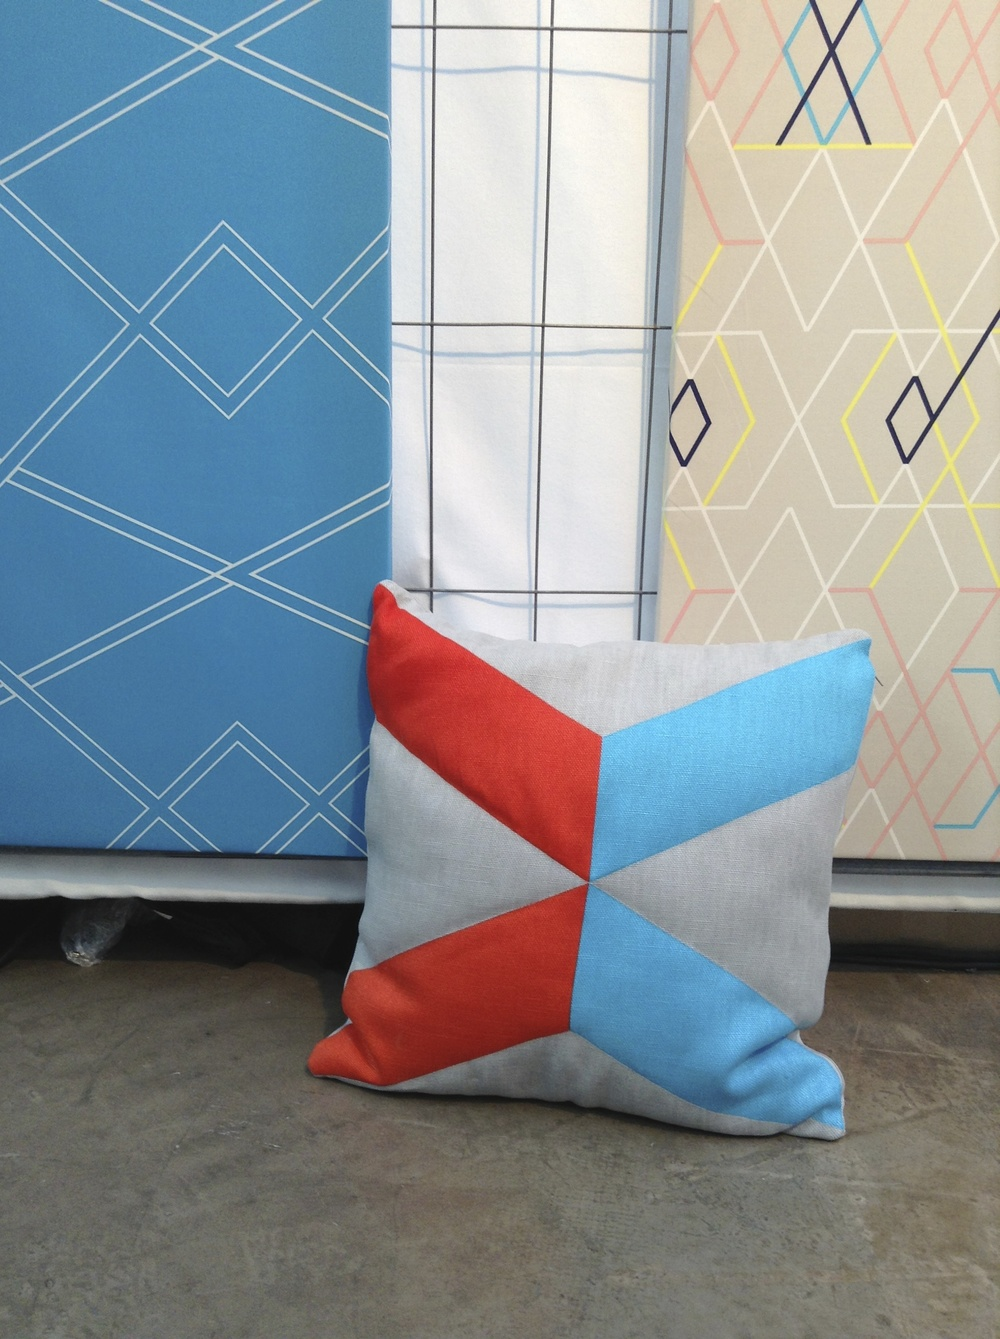 Polštář, design Margrethe Odgaard